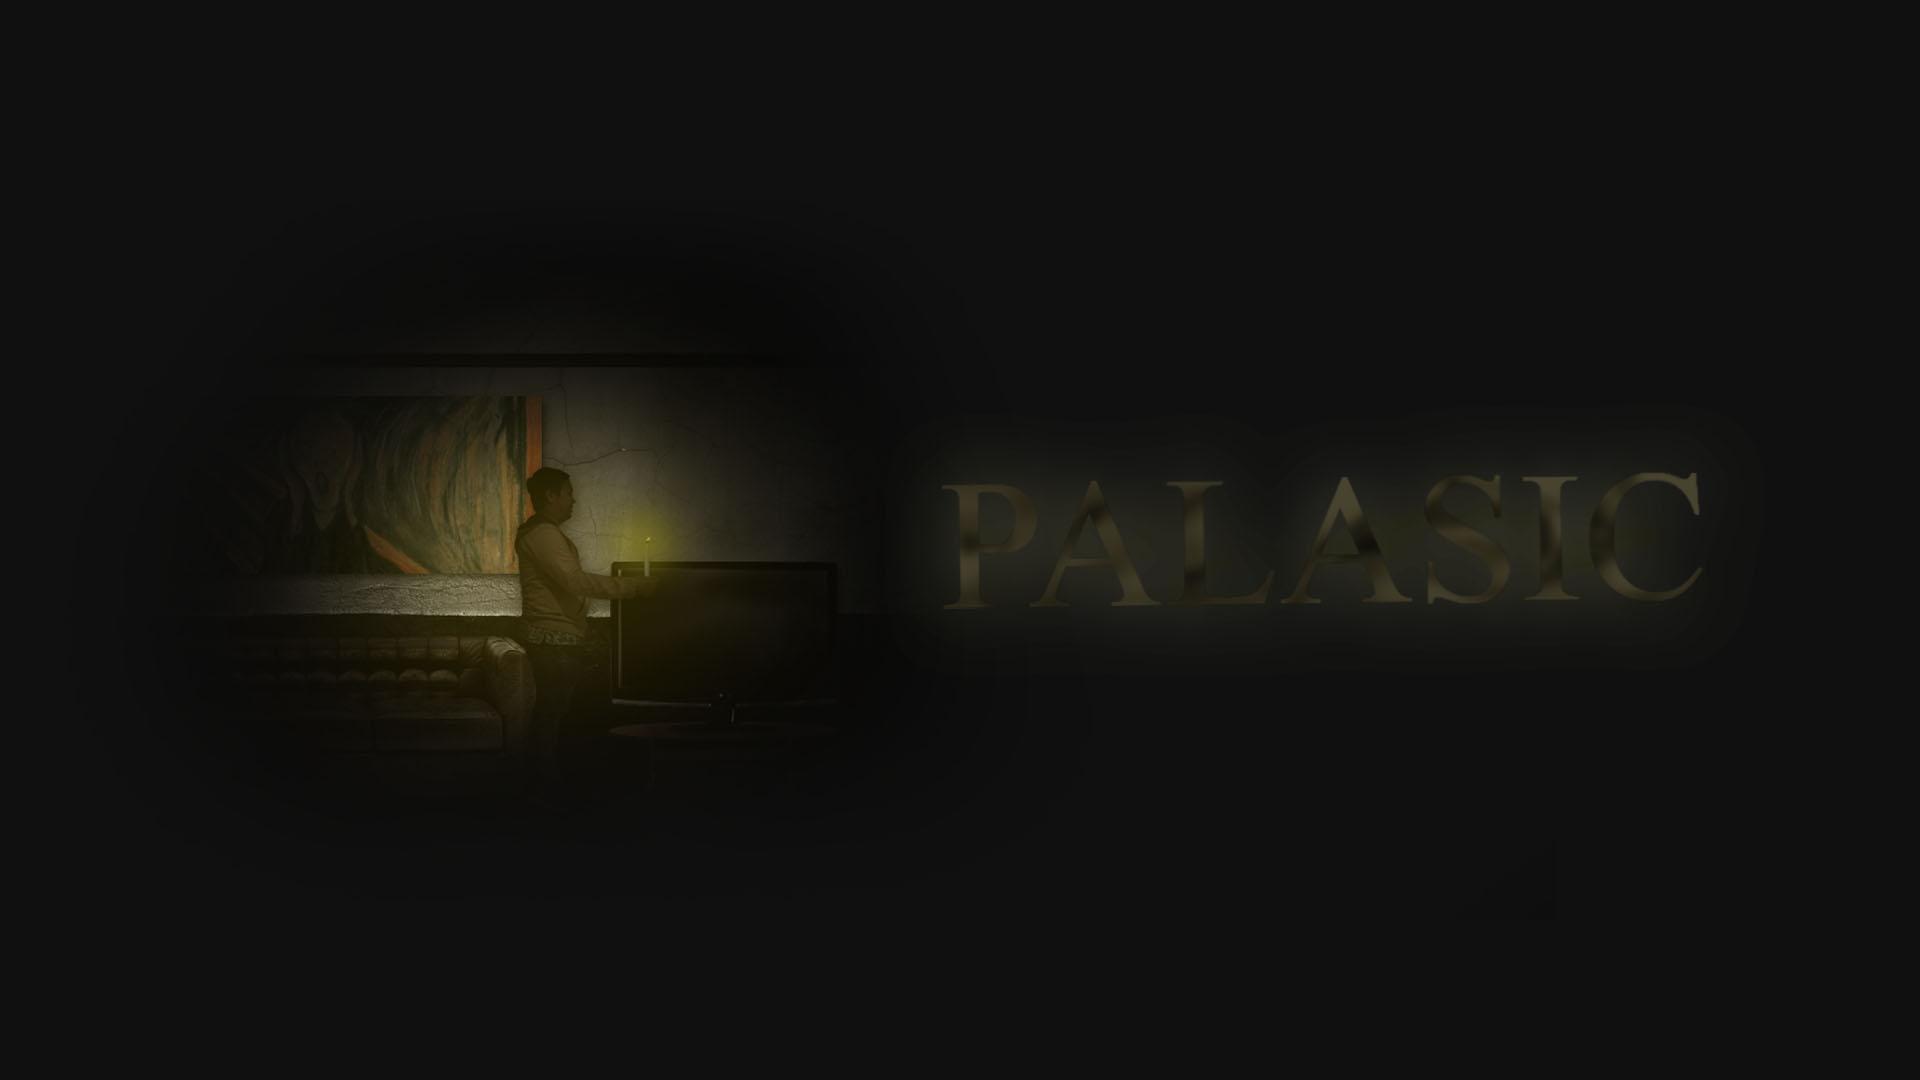 Palasic